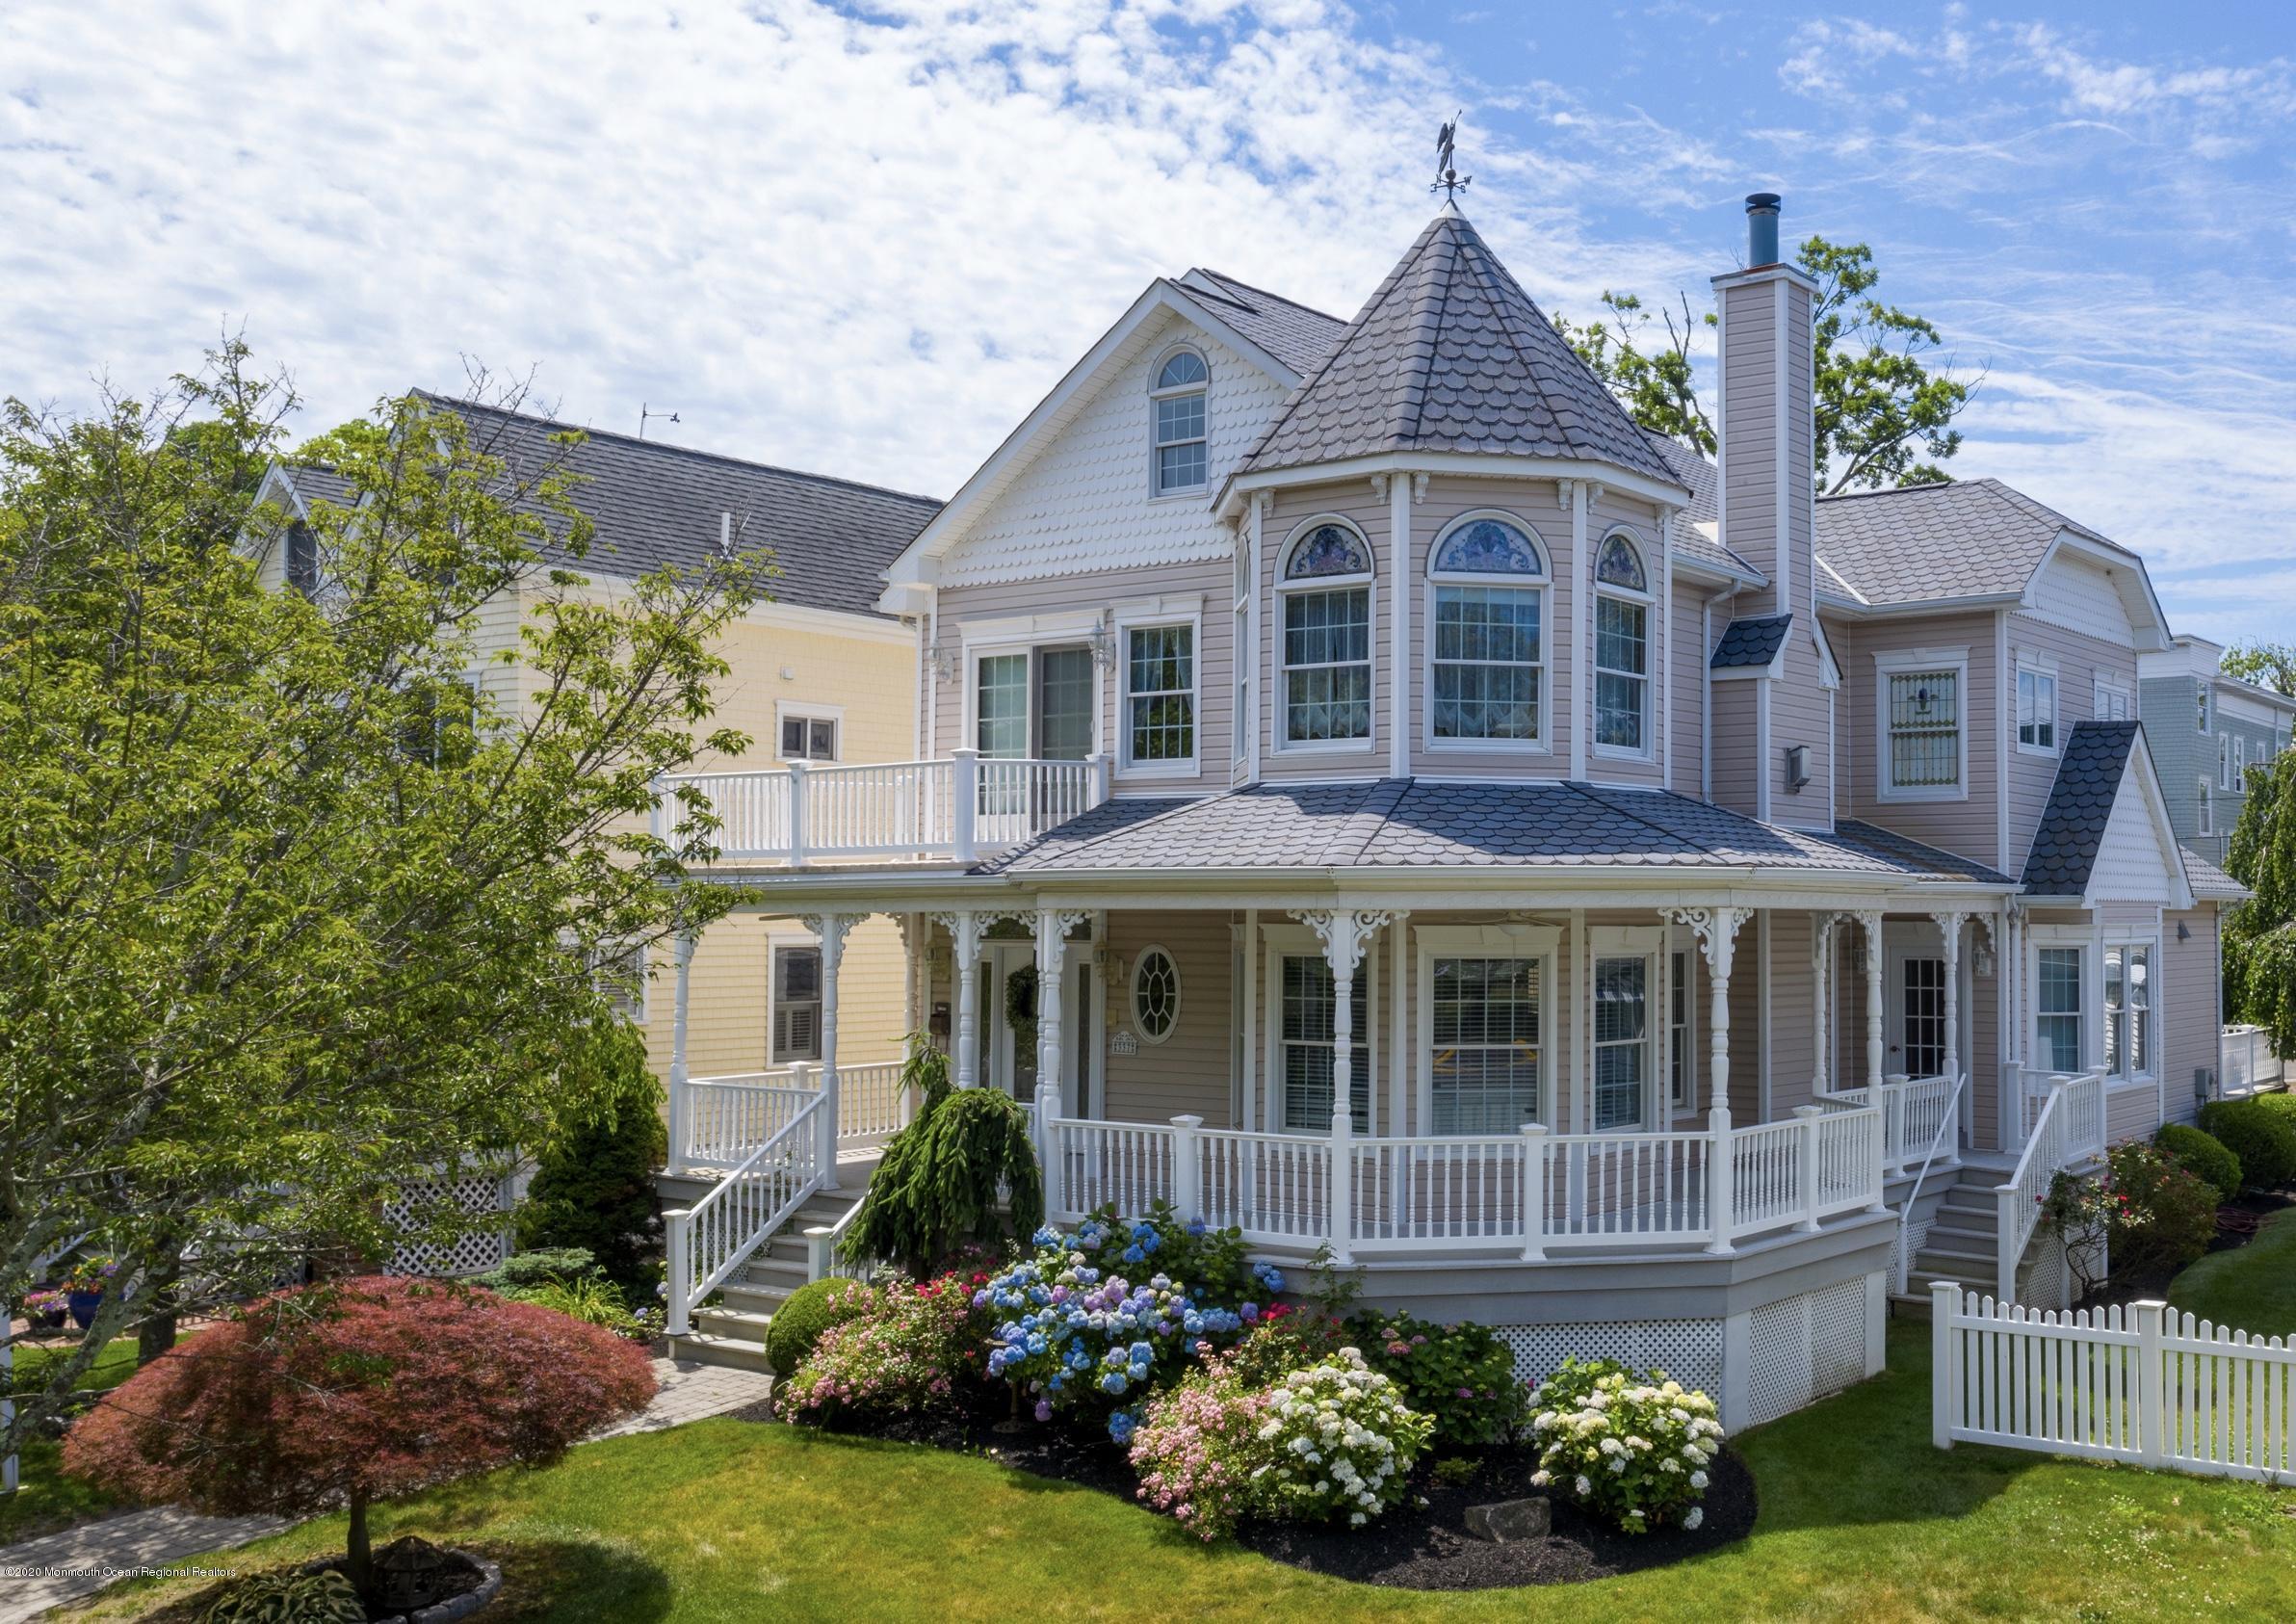 337 Woodland Avenue , Avon-by-the-sea, NJ 07717